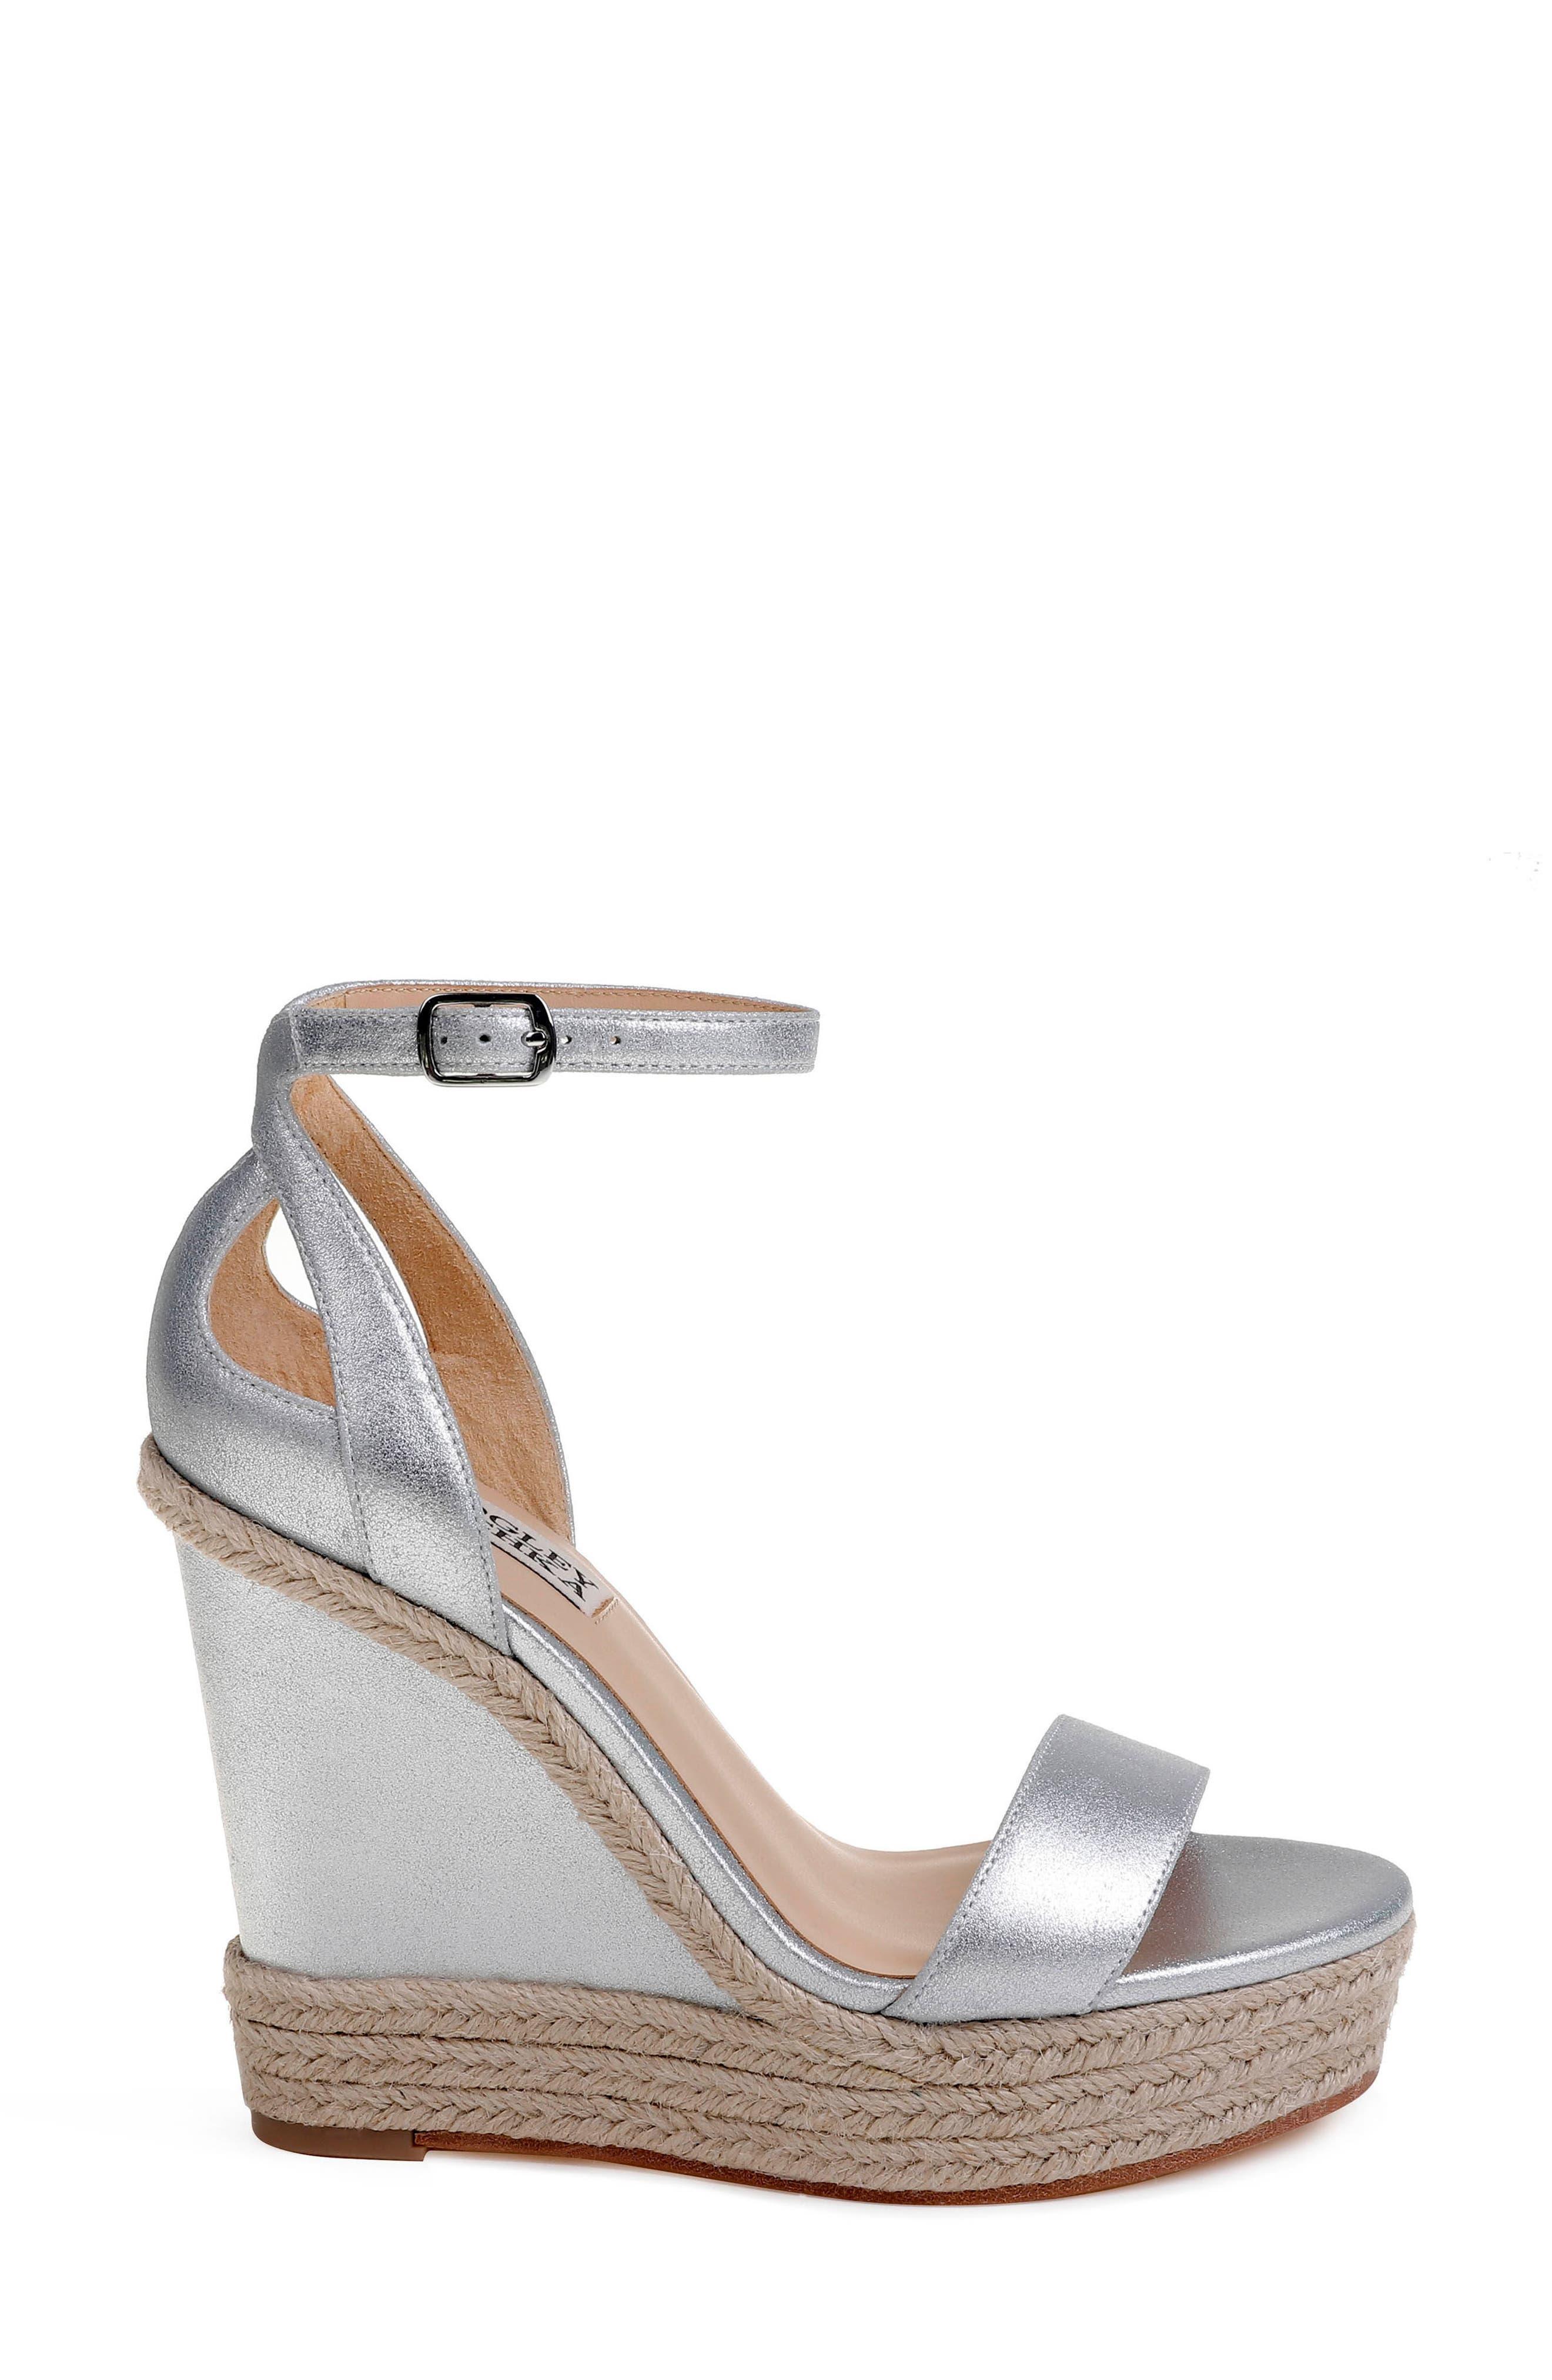 Honest Espadrille Wedge Sandal,                             Alternate thumbnail 3, color,                             Silver Metallic Suede